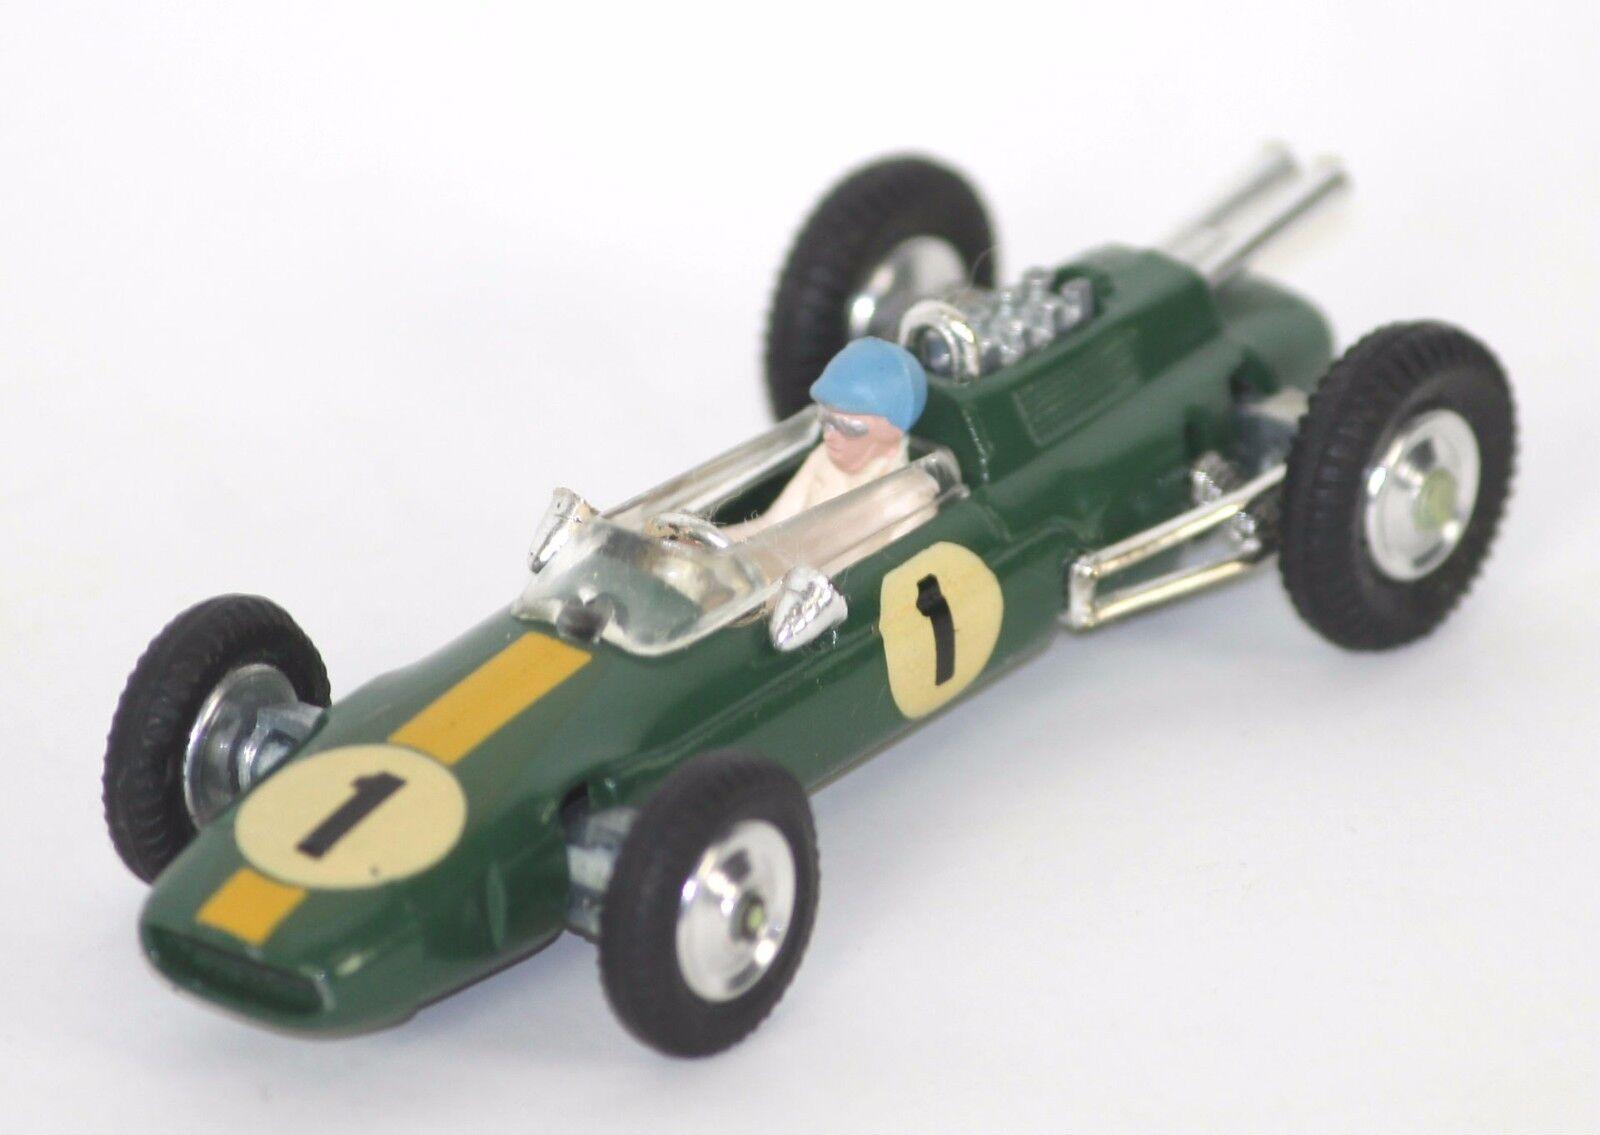 Climax Lotus Formule métal 1 in (environ 2.54 cm). CORGI TOYS. ESC 1 43. ref 155.